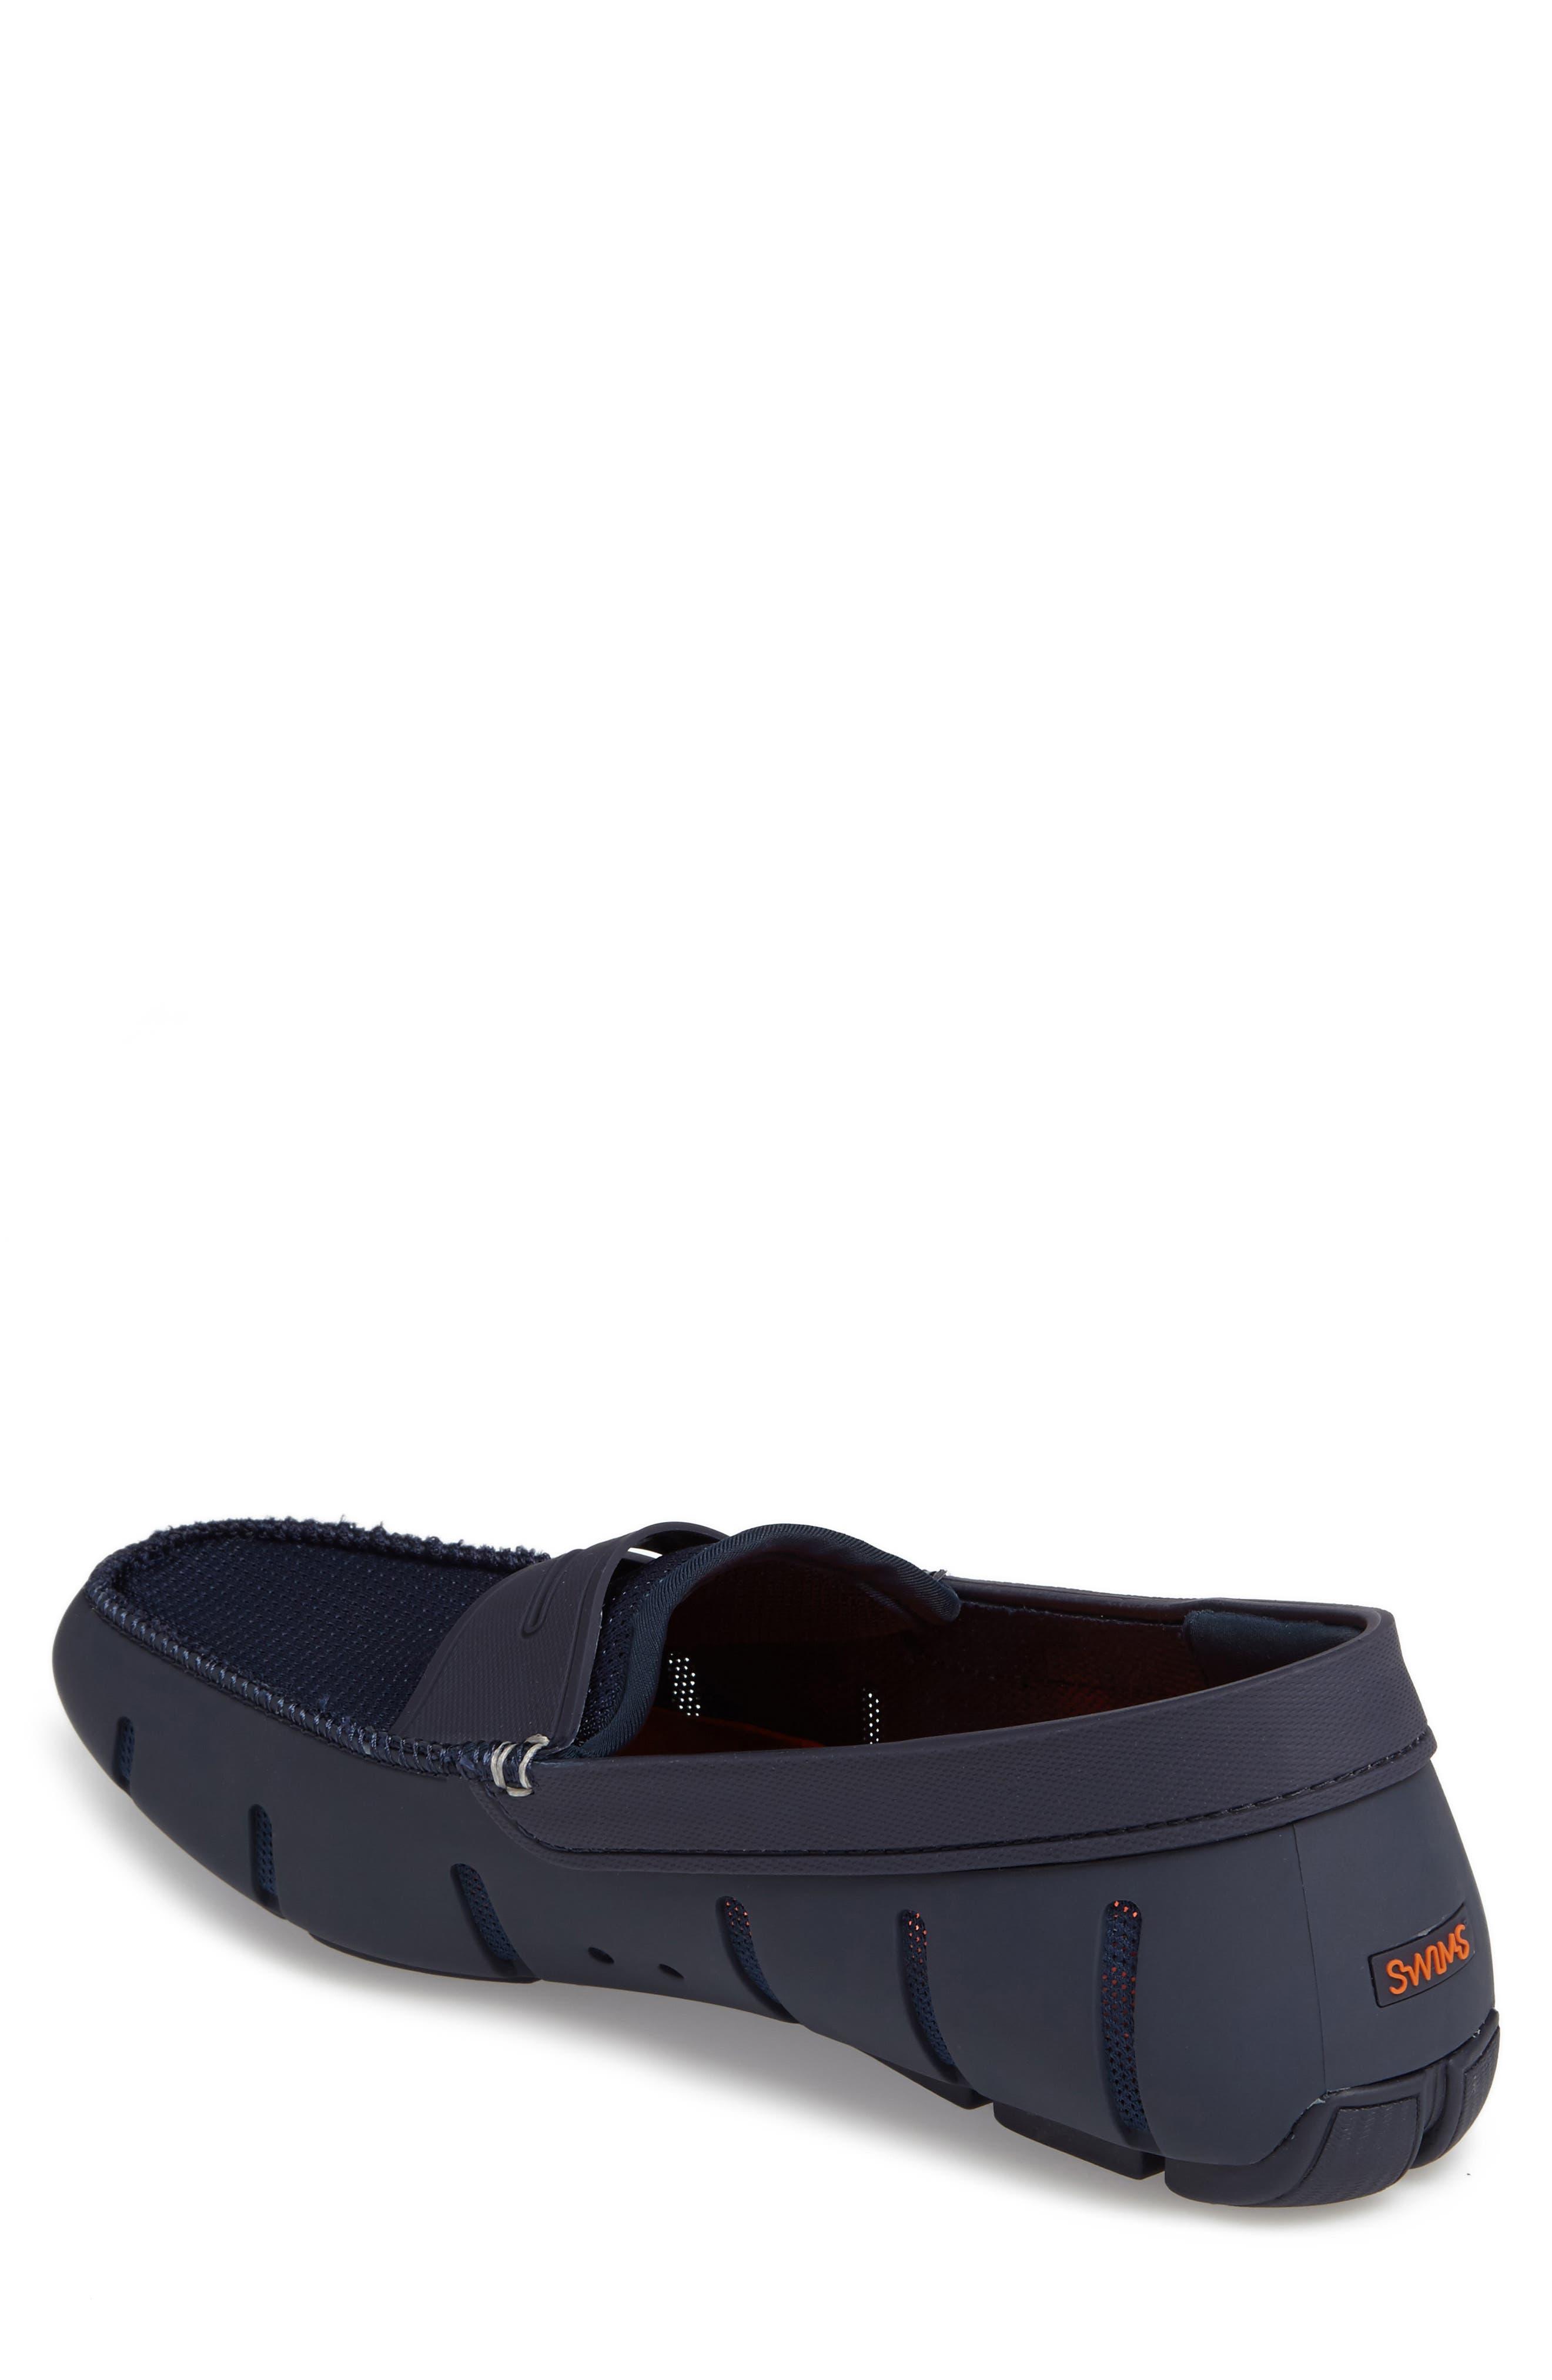 5d184b564bb Swims Shoes